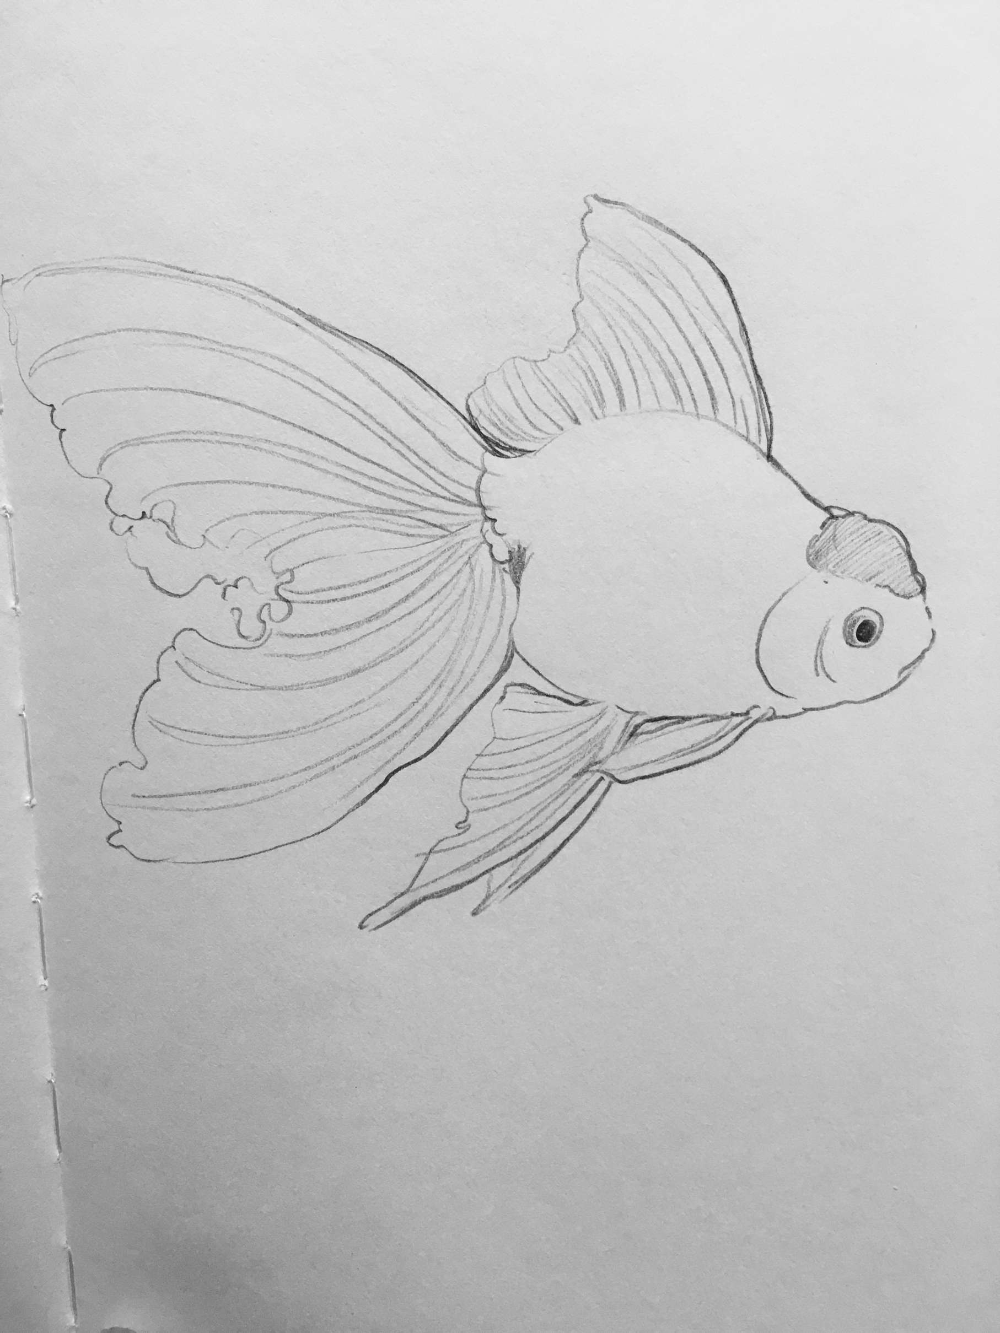 Goldfish Pencil Sketch And Drawing A Fish Drawings Drawings Fish Art